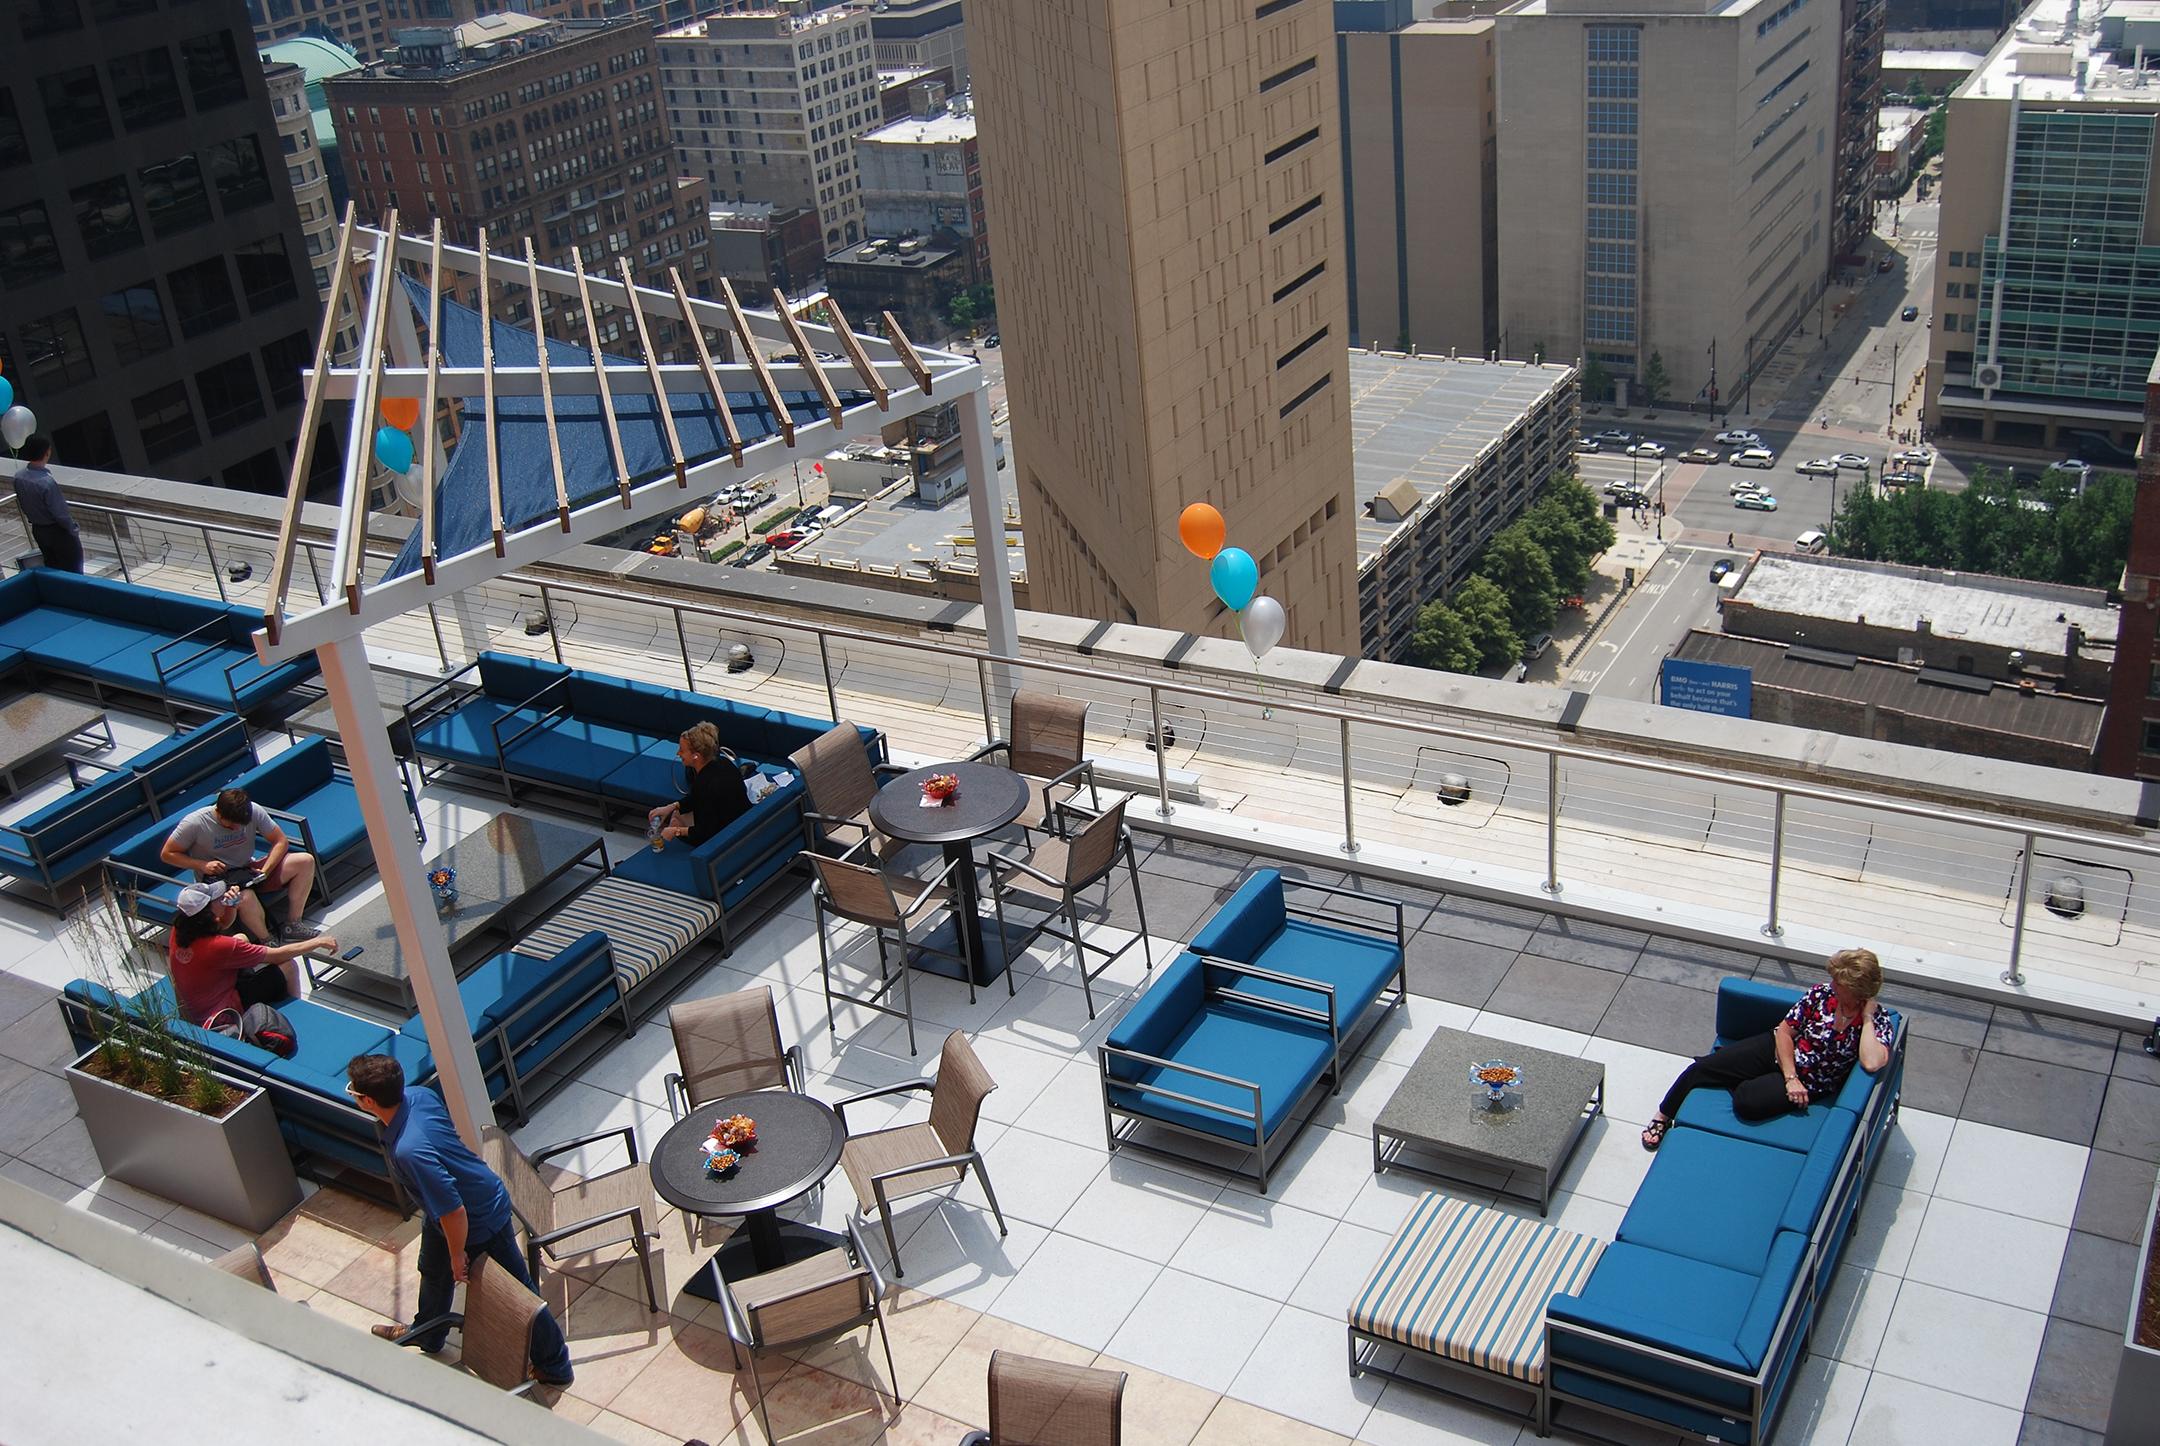 111 W Jackson's Rooftop Deck